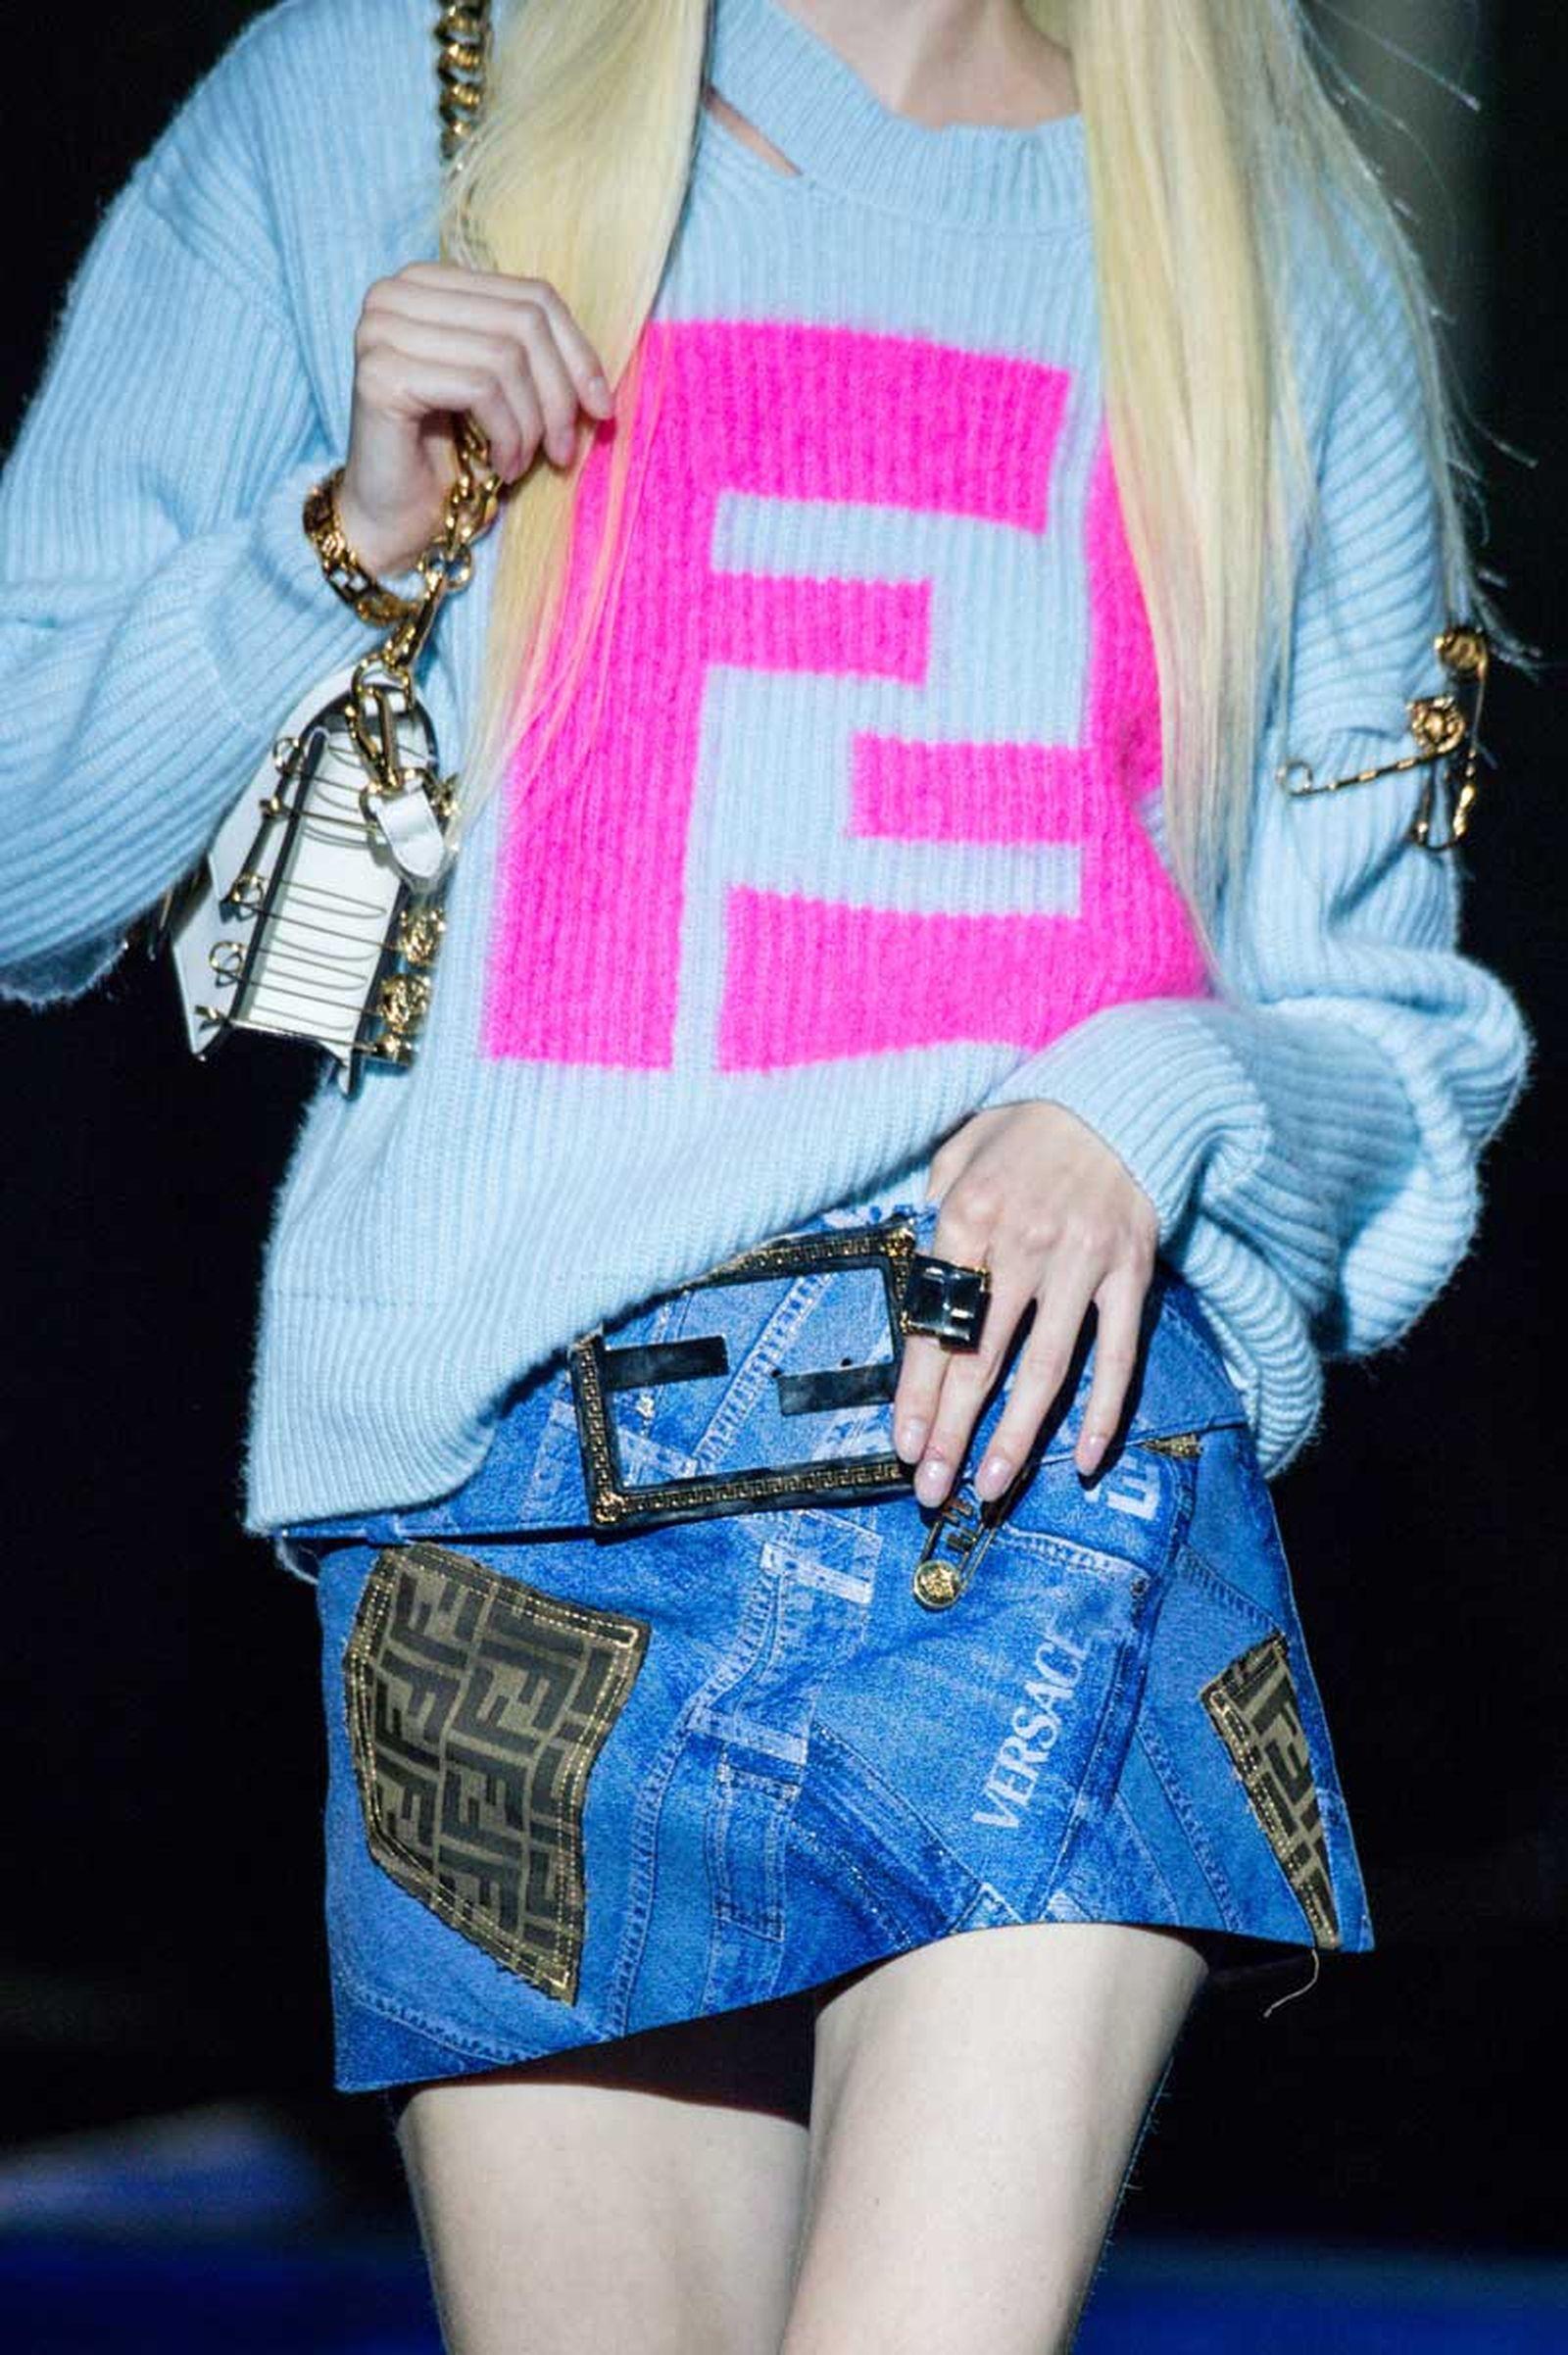 versace-fendi-collab--(29)